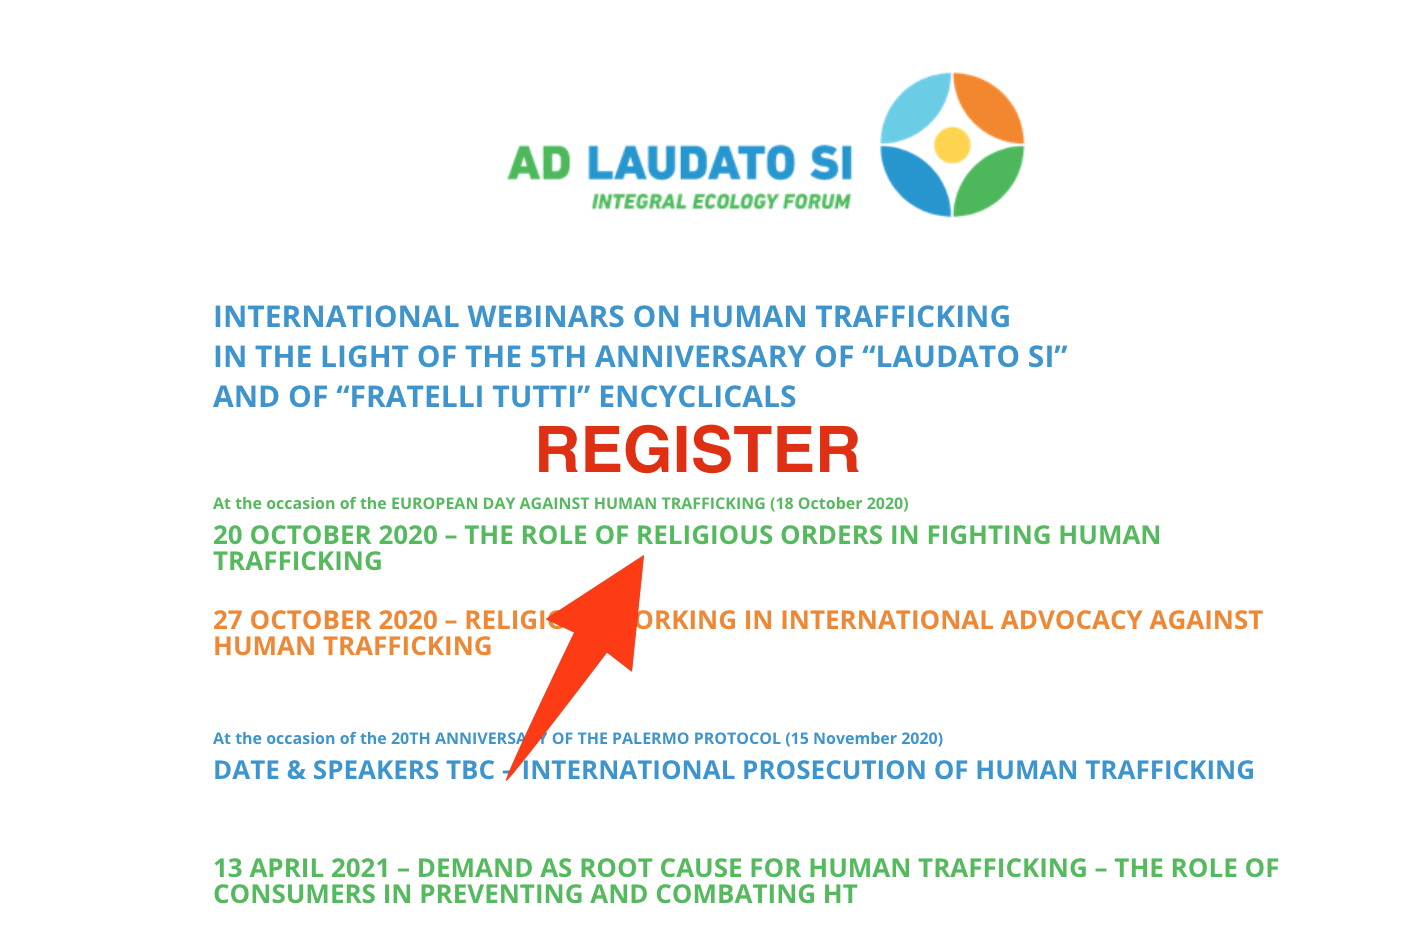 Access an online course on Hman Trafficking